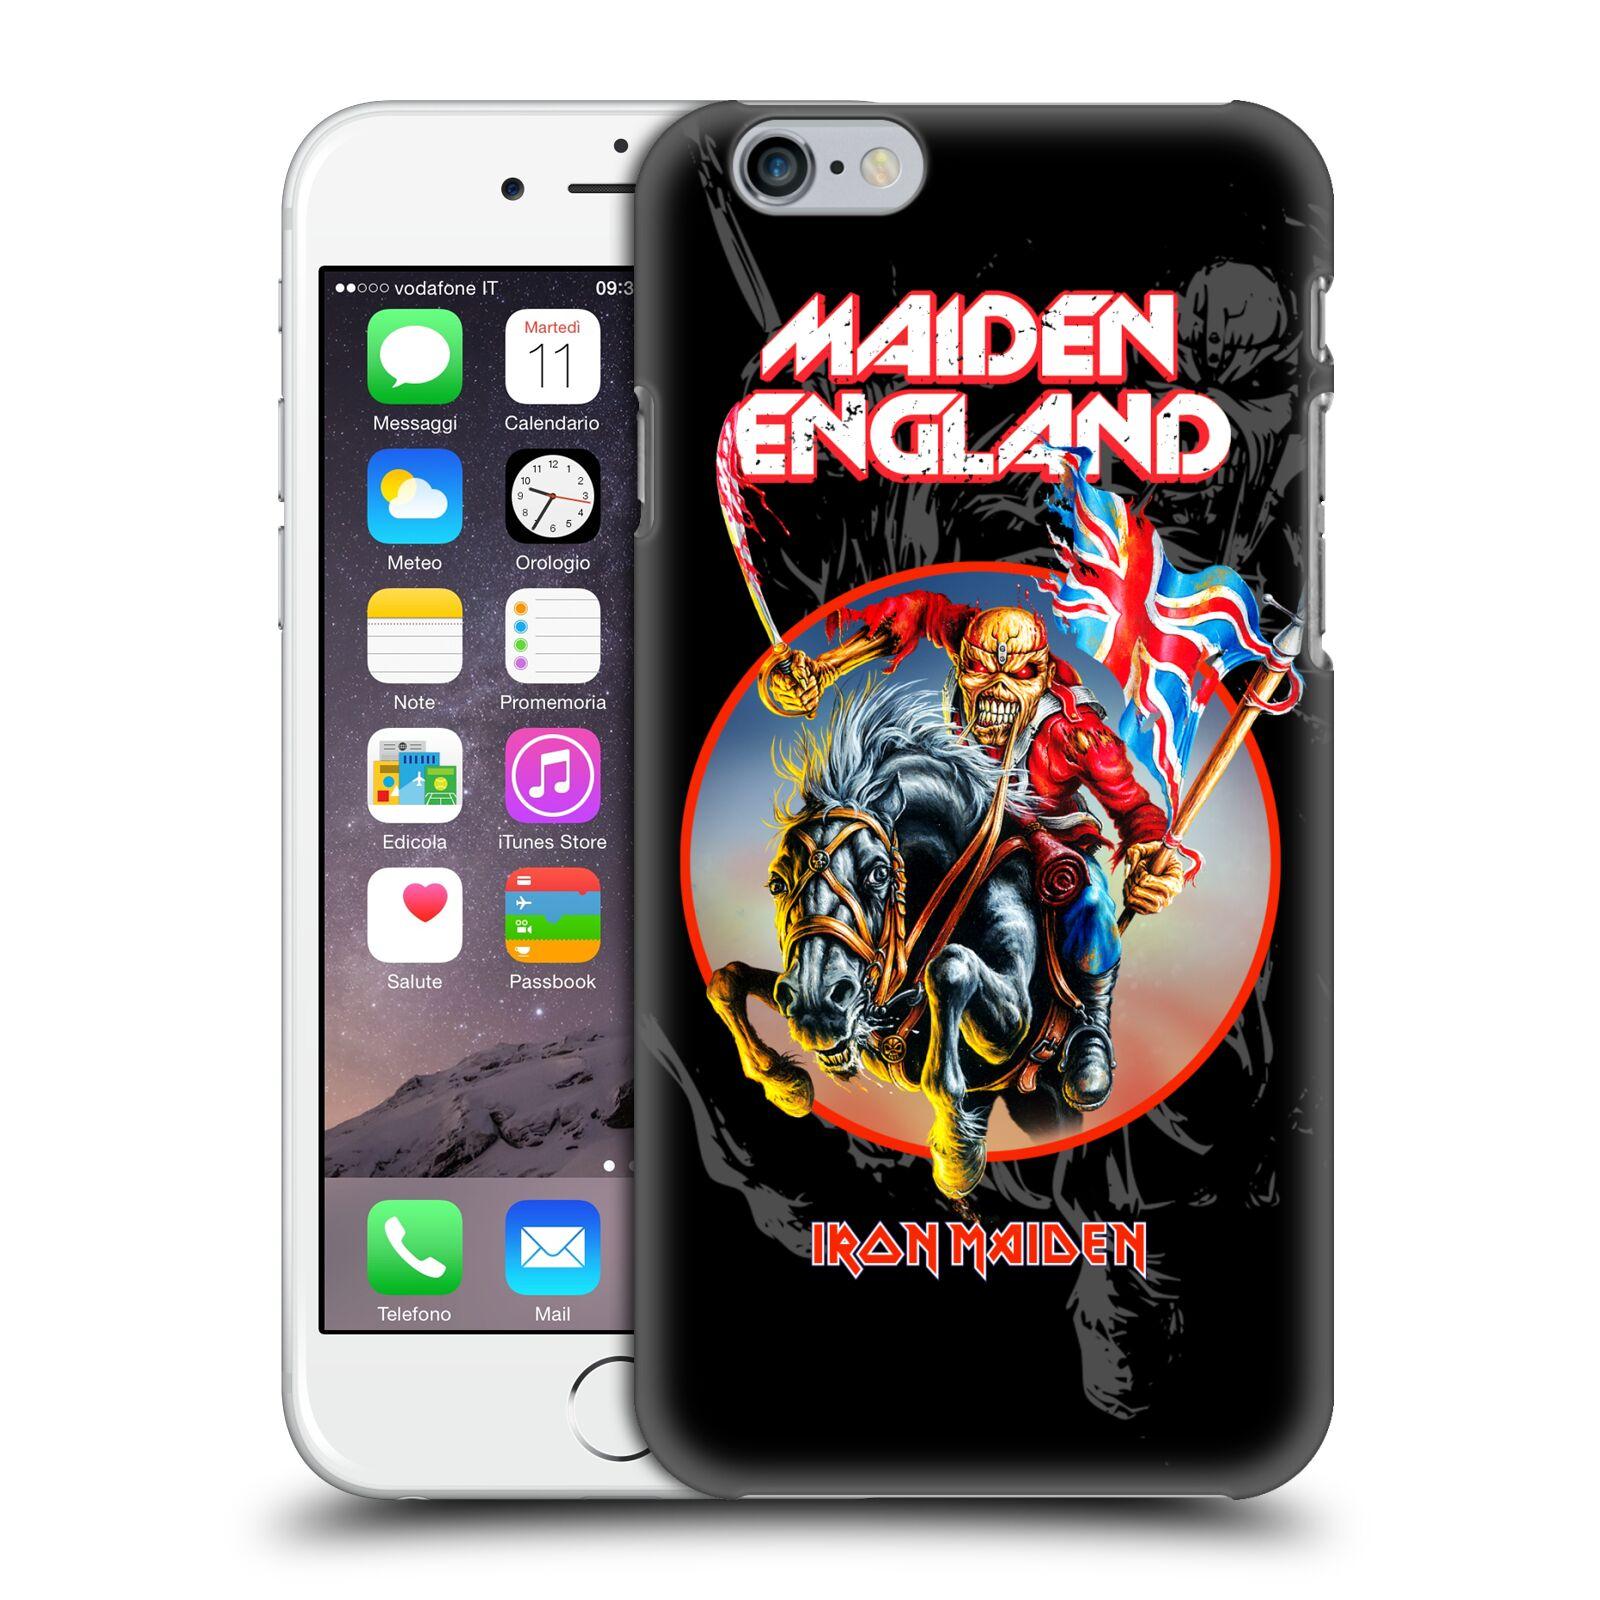 UFFICIALE-IRON-MAIDEN-TOUR-COVER-RETRO-RIGIDA-PER-APPLE-iPHONE-TELEFONI